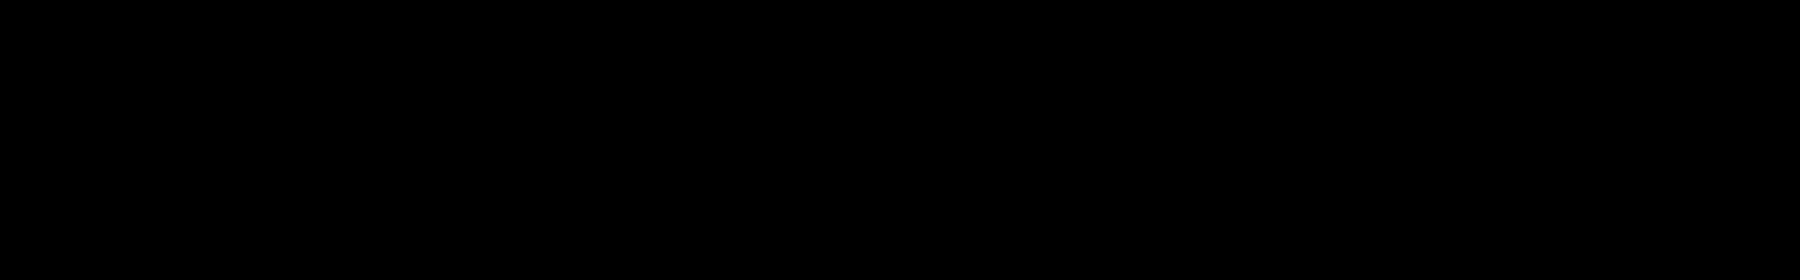 The Guitar Plug V2 audio waveform